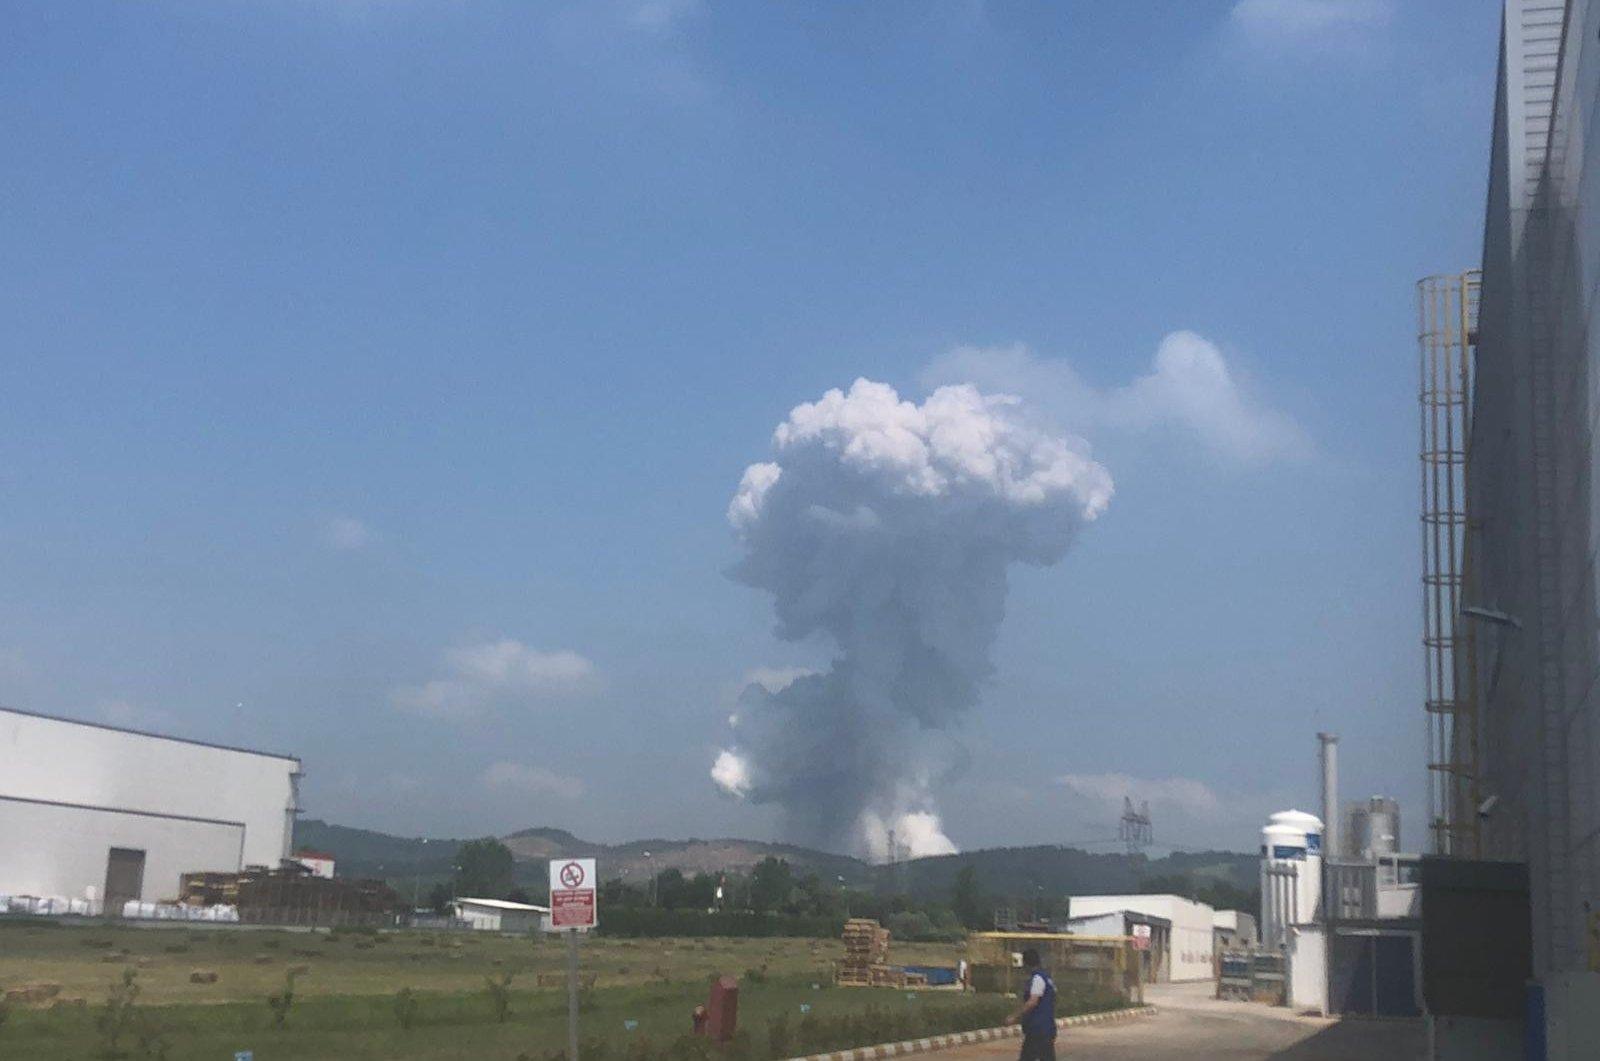 Smoke rises above the scene of an explosion at a fireworks factory in Sakarya, Turkey, June 3, 2020. (IHA Photo)